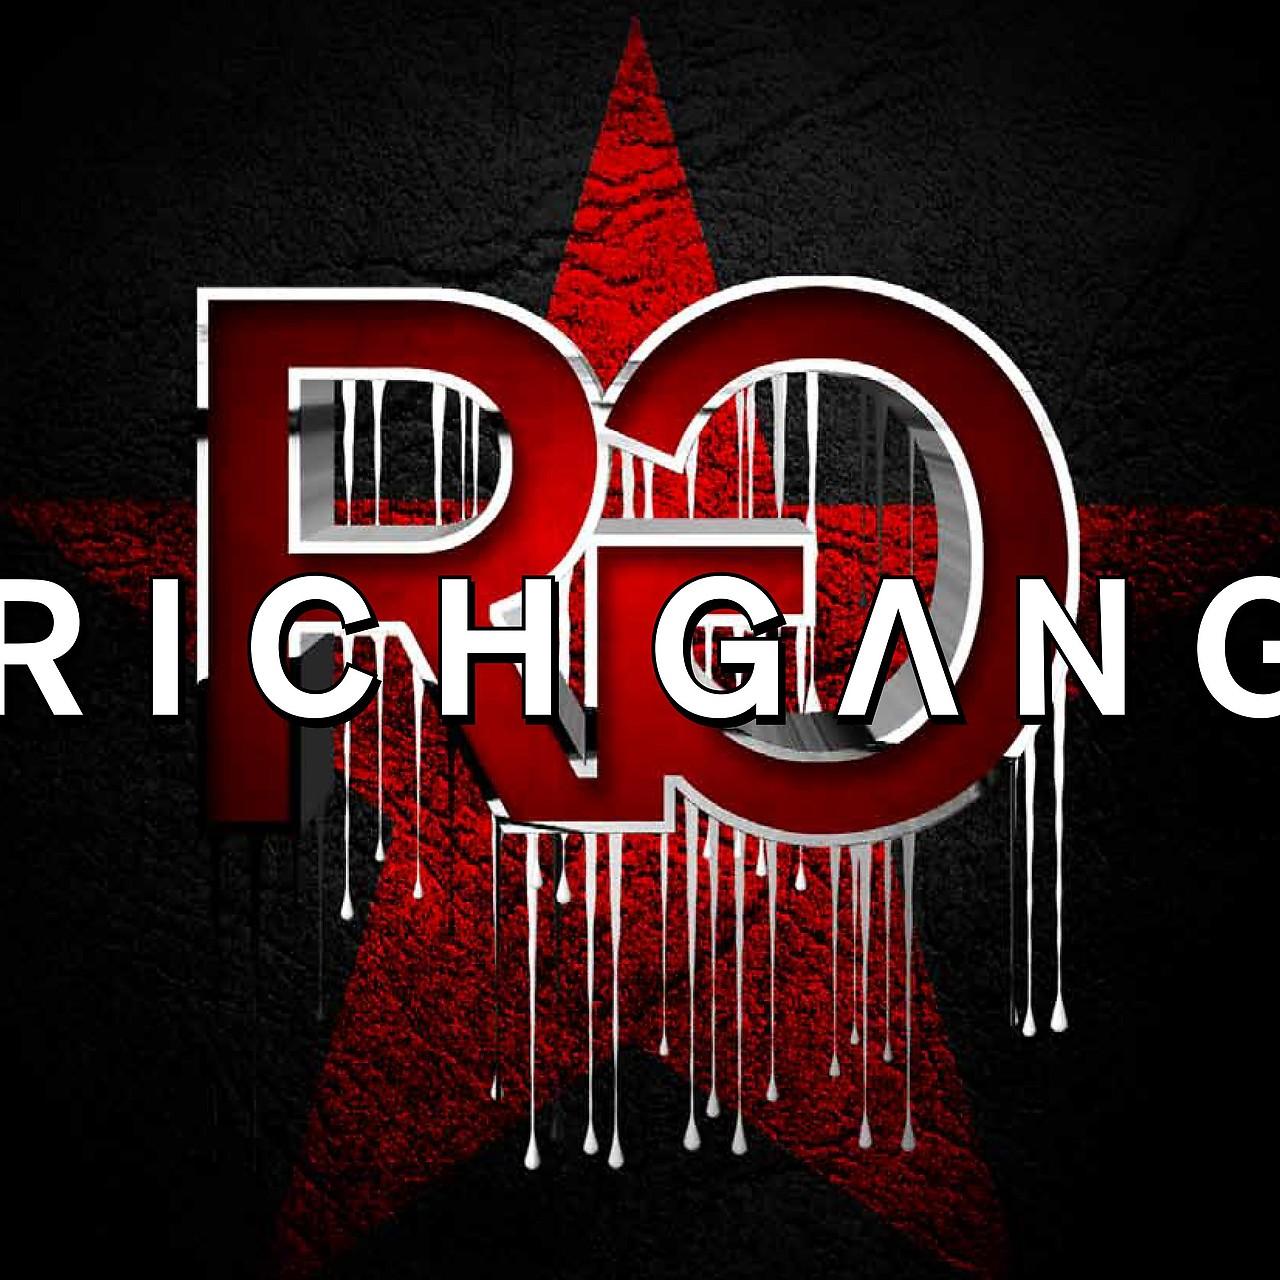 rich gang tha tour part 2 download